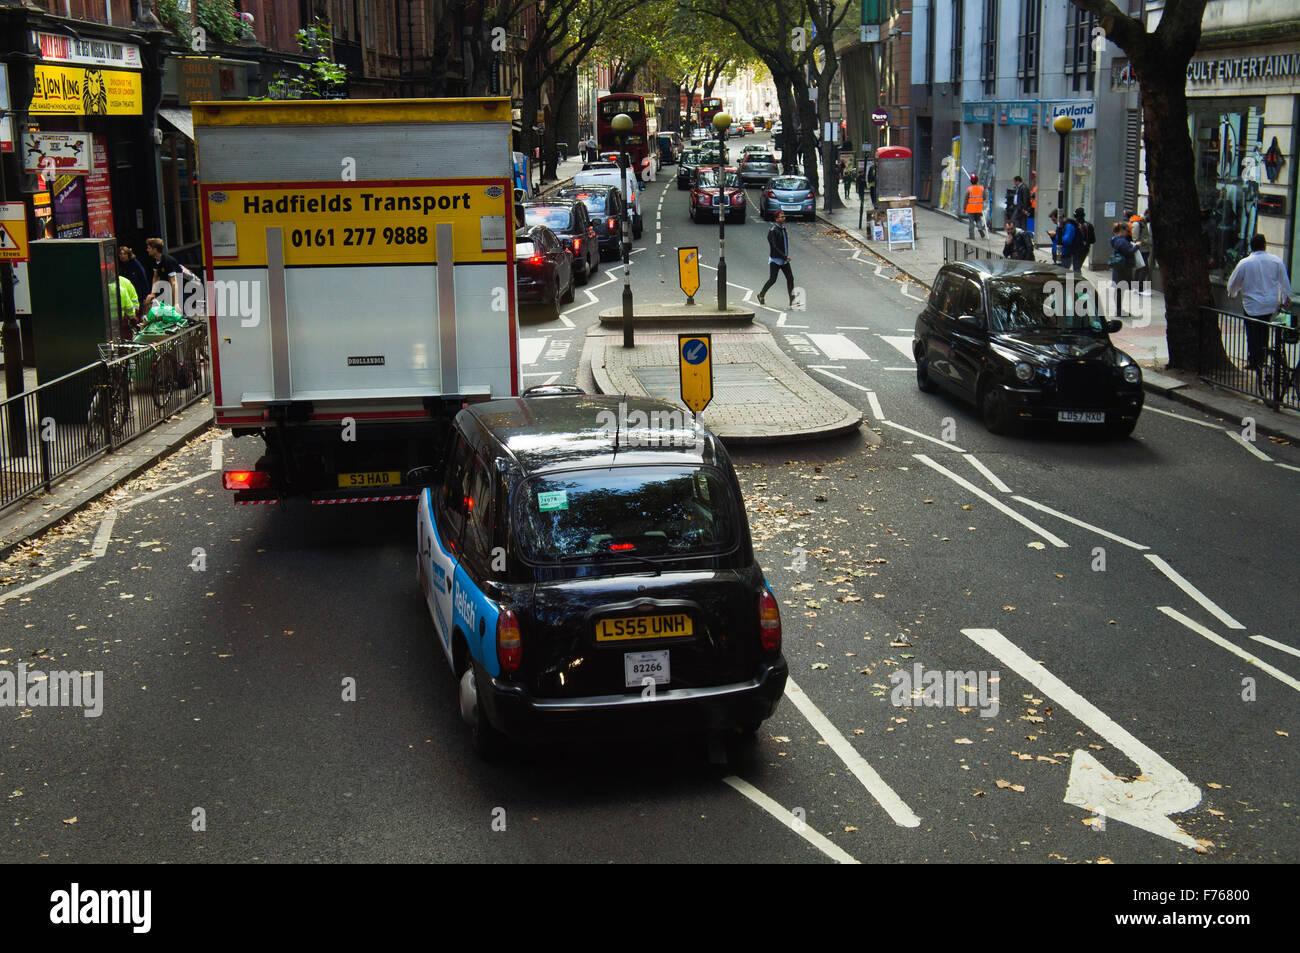 London taxi, hackney carriage, black cab, hack - Stock Image